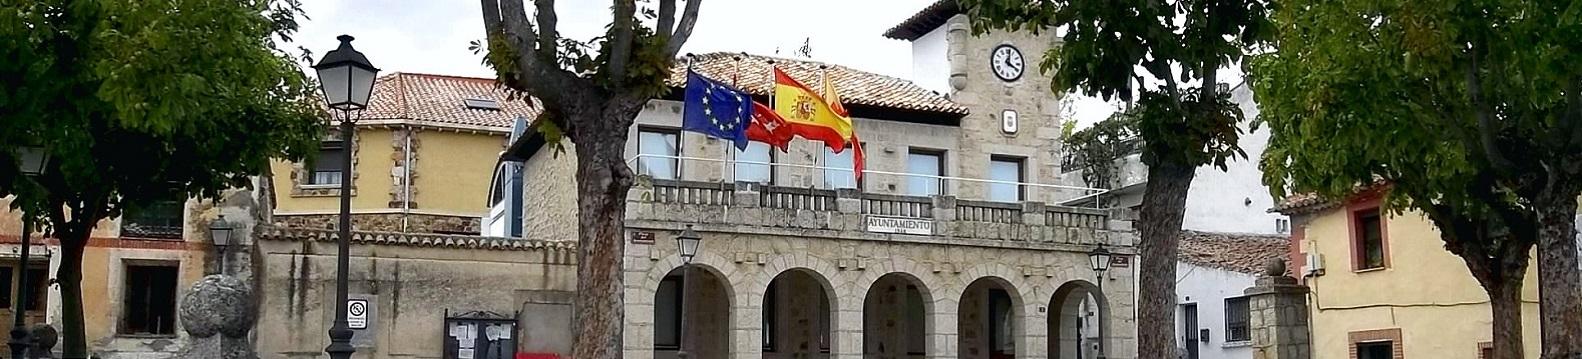 5-Fondo4-AyuntamientoOK2